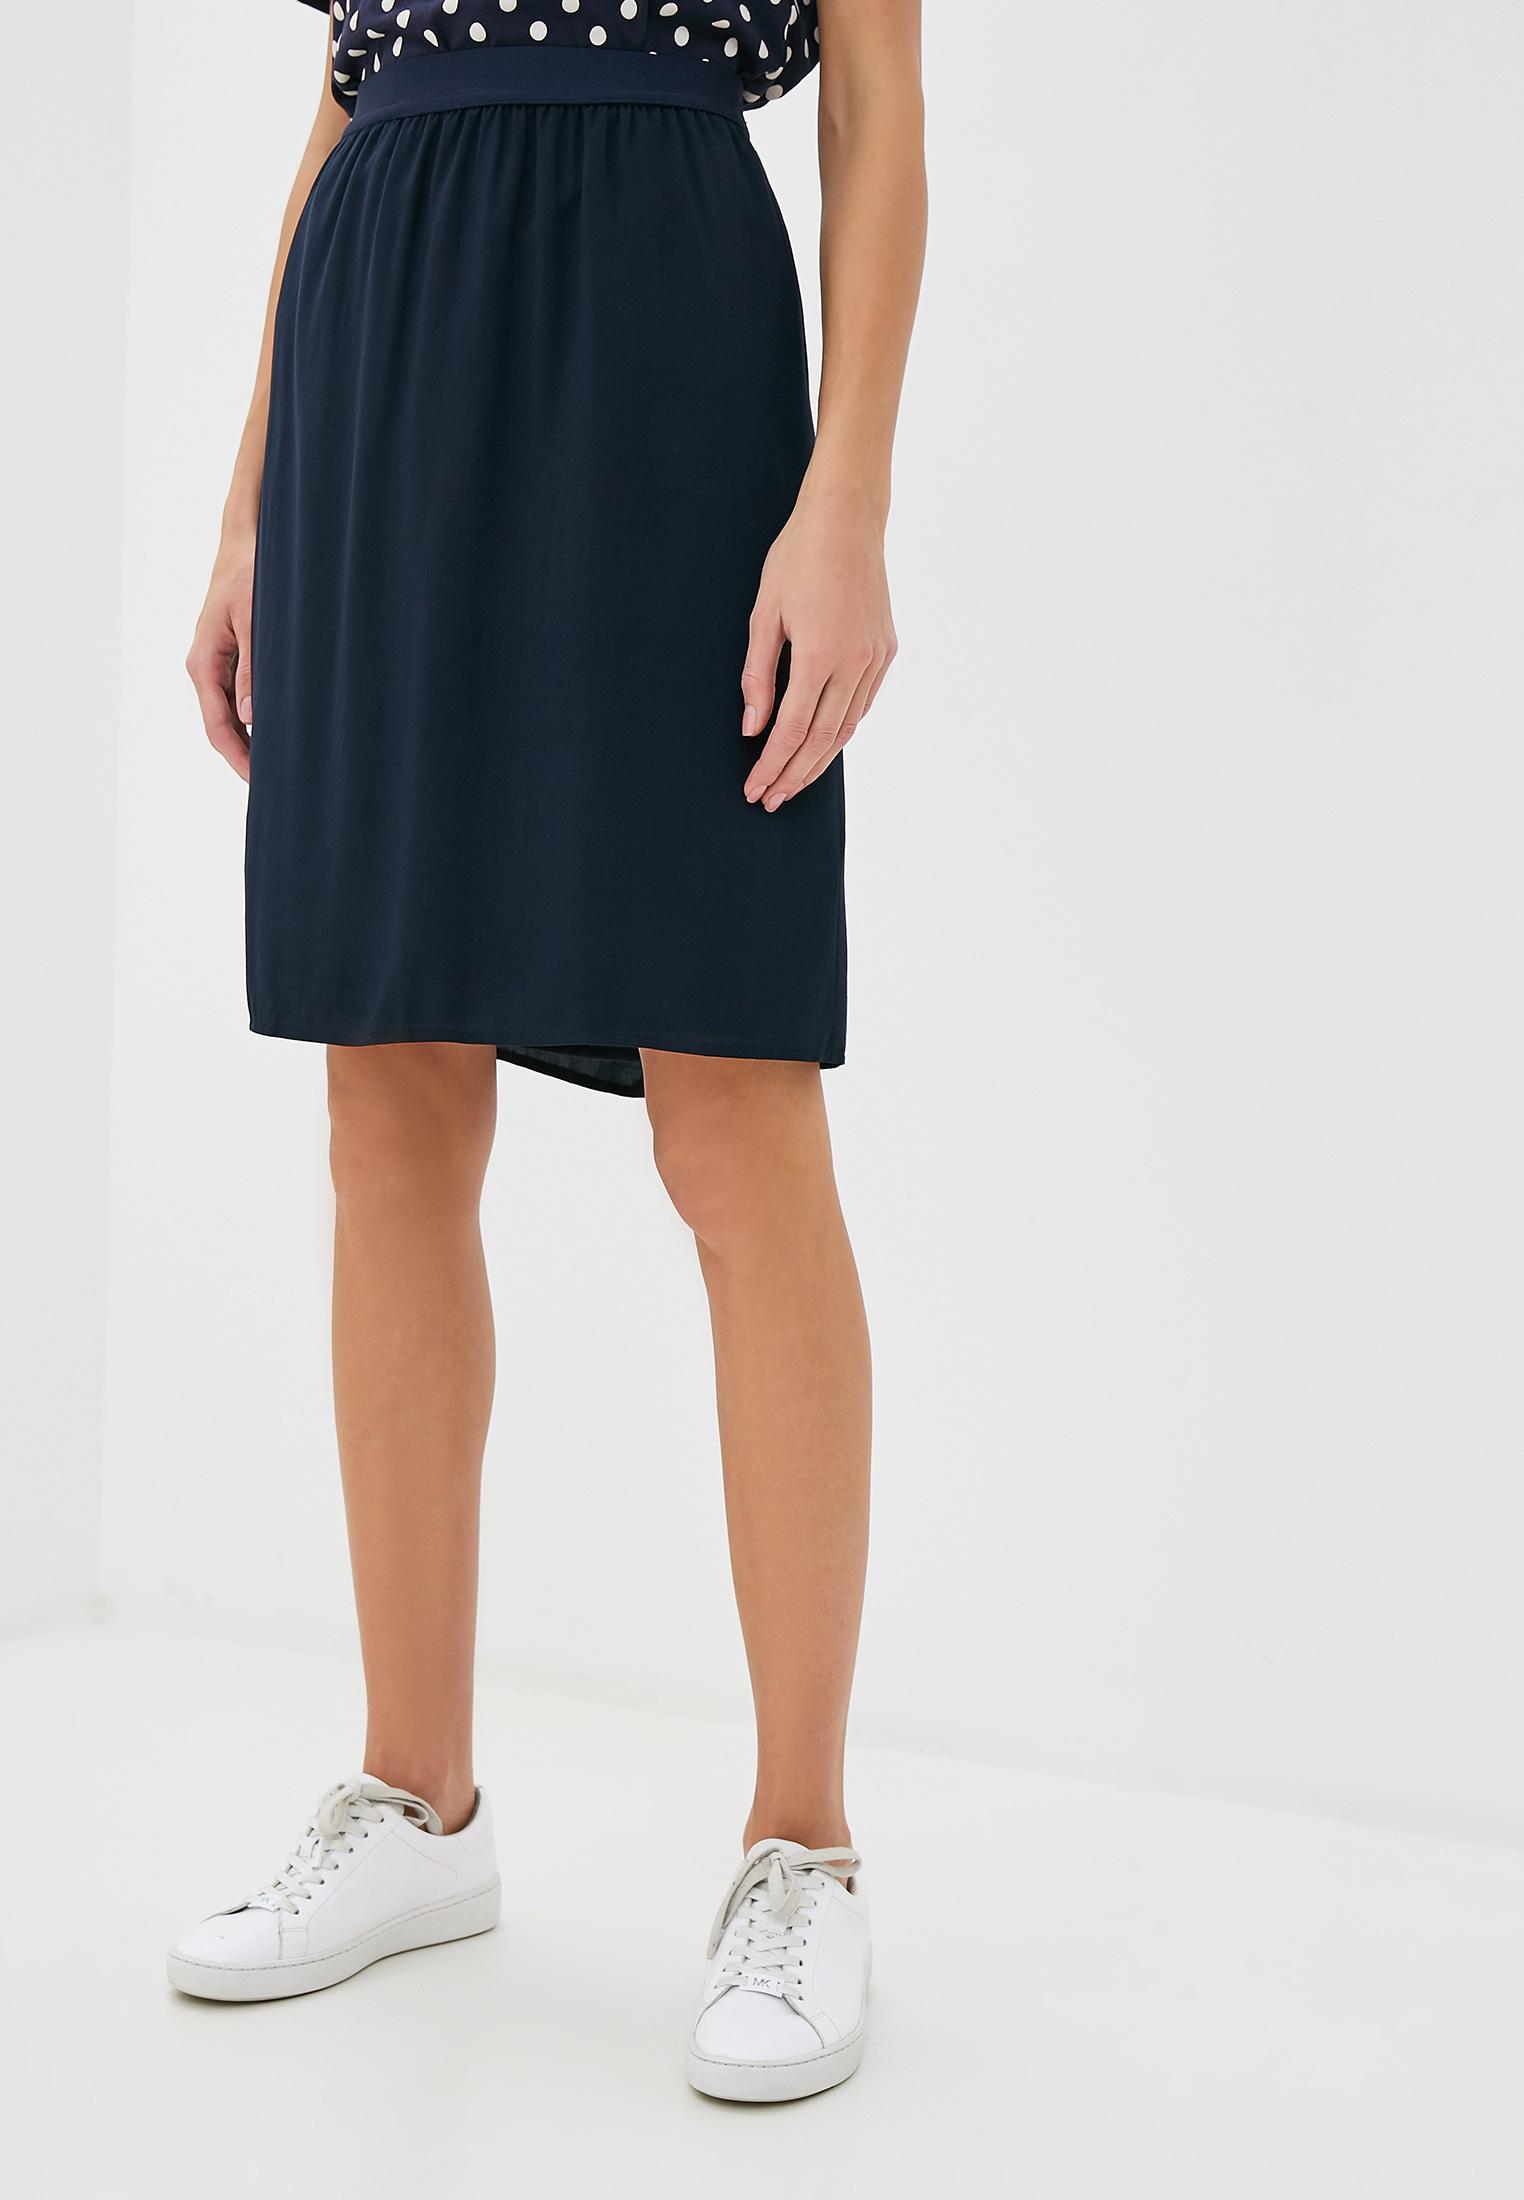 Широкая юбка Gerry Weber (Гарри Вебер) 610134-67567